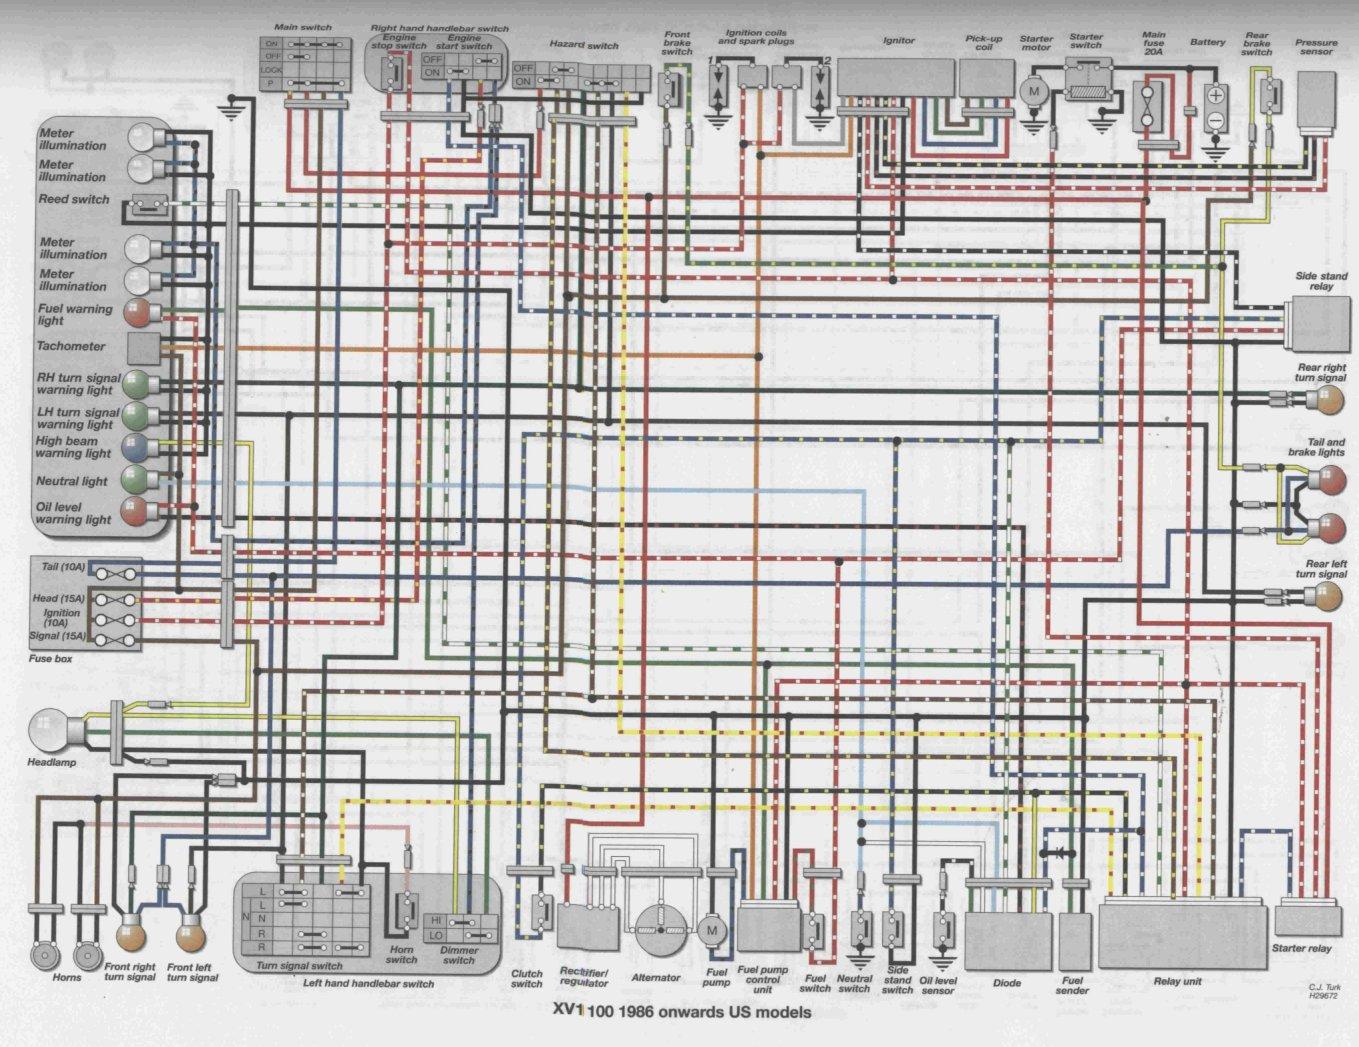 86_96_us_XV1100?resize=665%2C512 1996 yamaha virago 535 wiring diagram wiring diagram 1993 yamaha virago 535 wiring diagram at creativeand.co